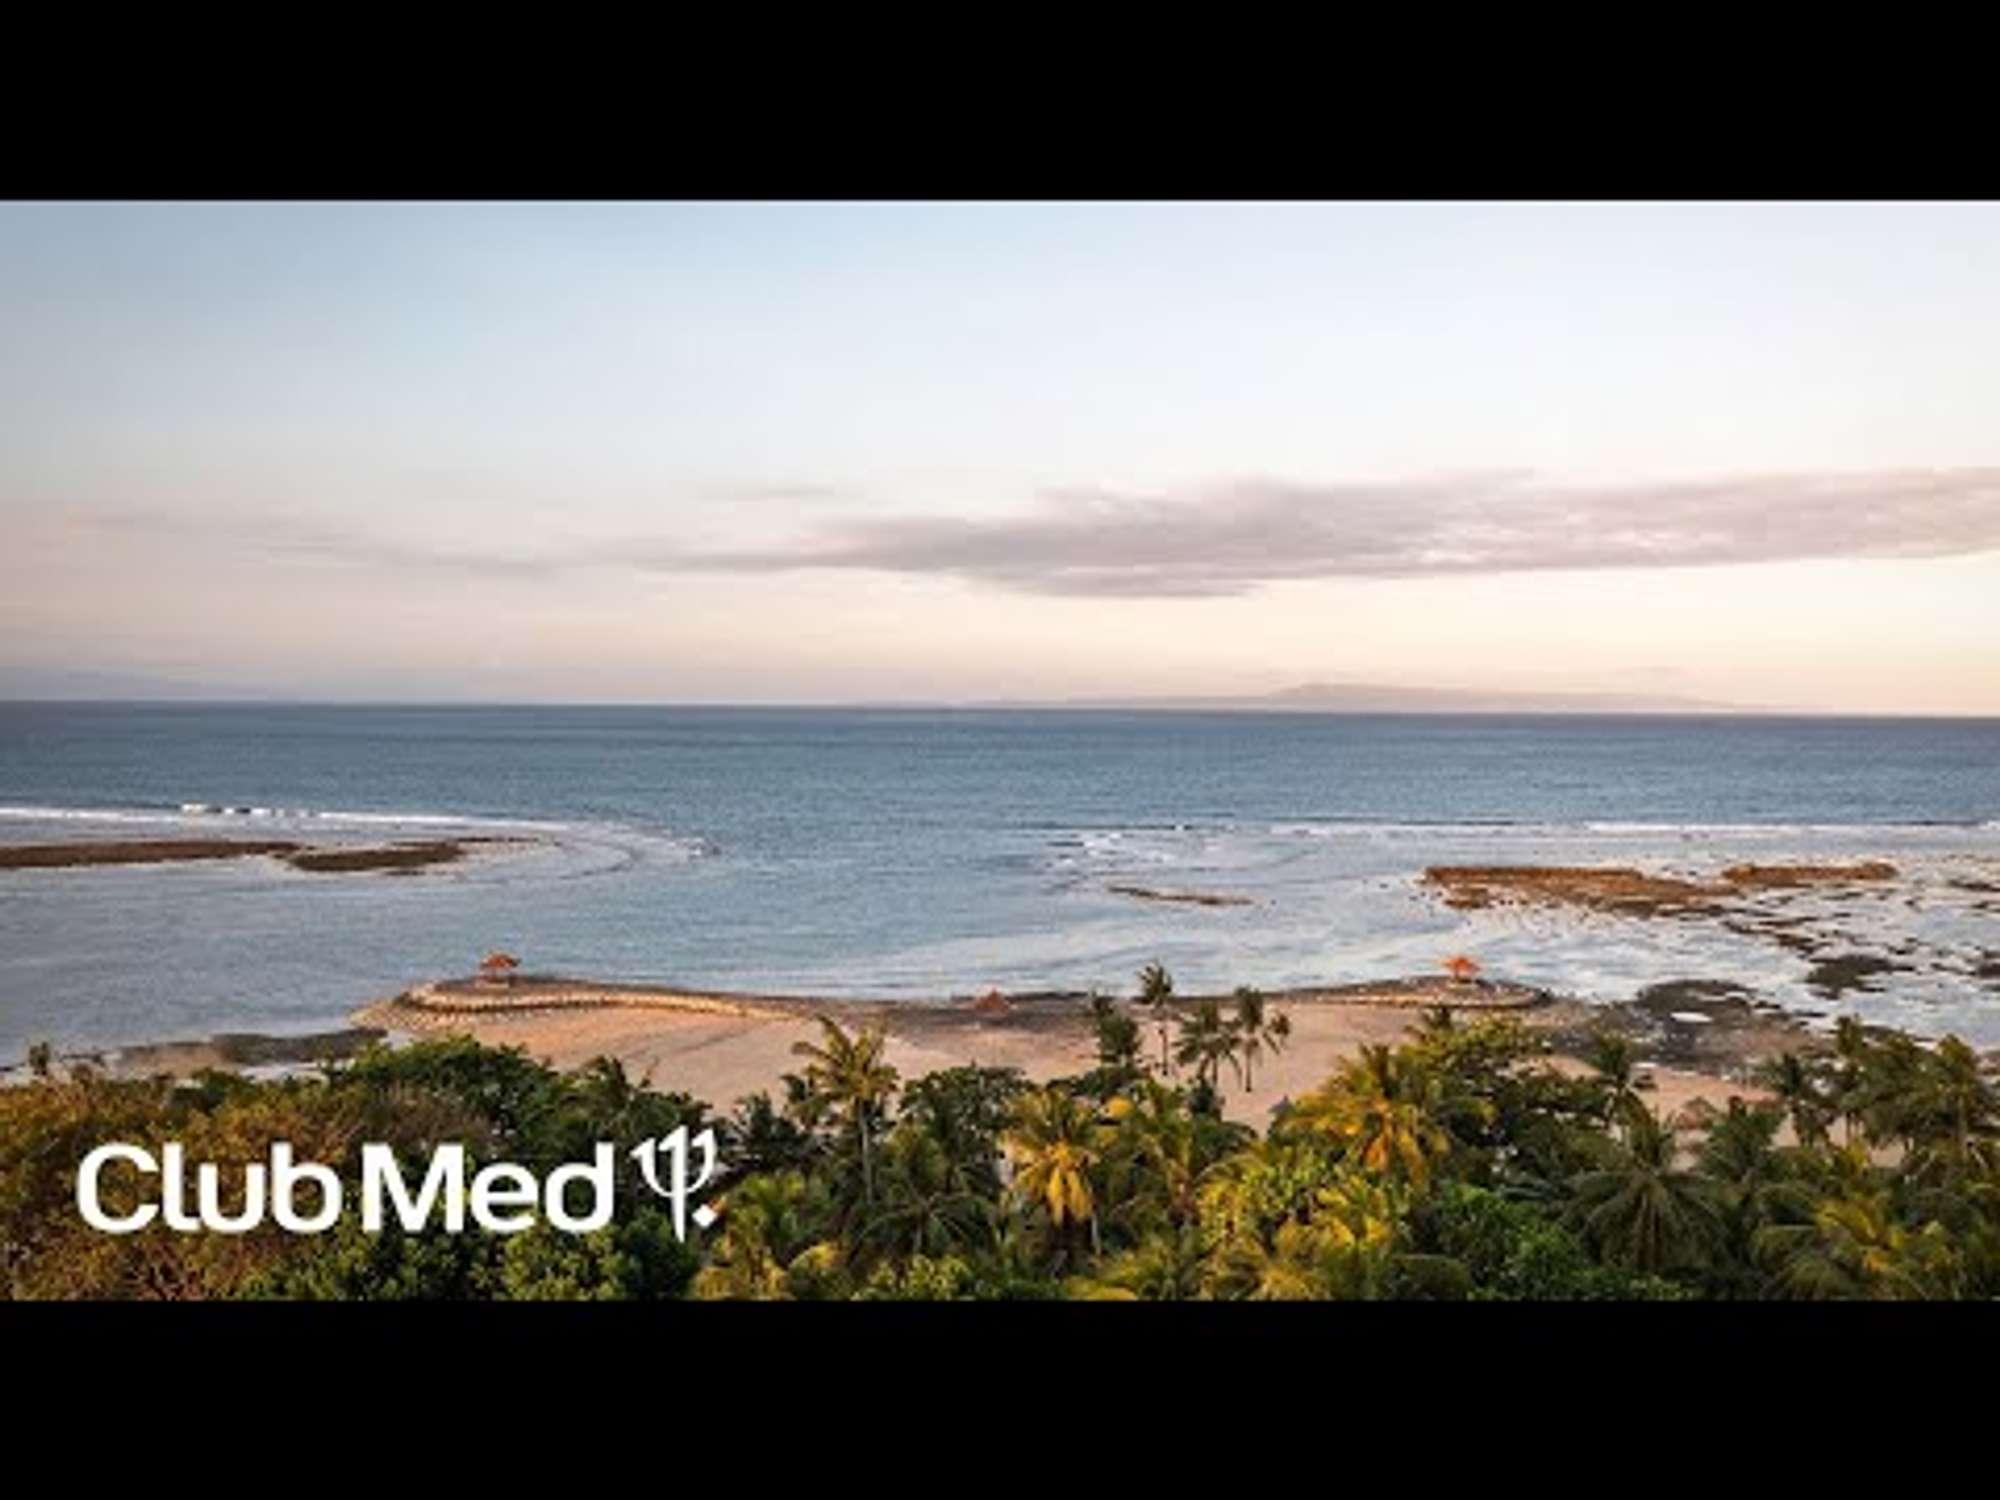 Open Bali וידיאו slideshow gallery at 1